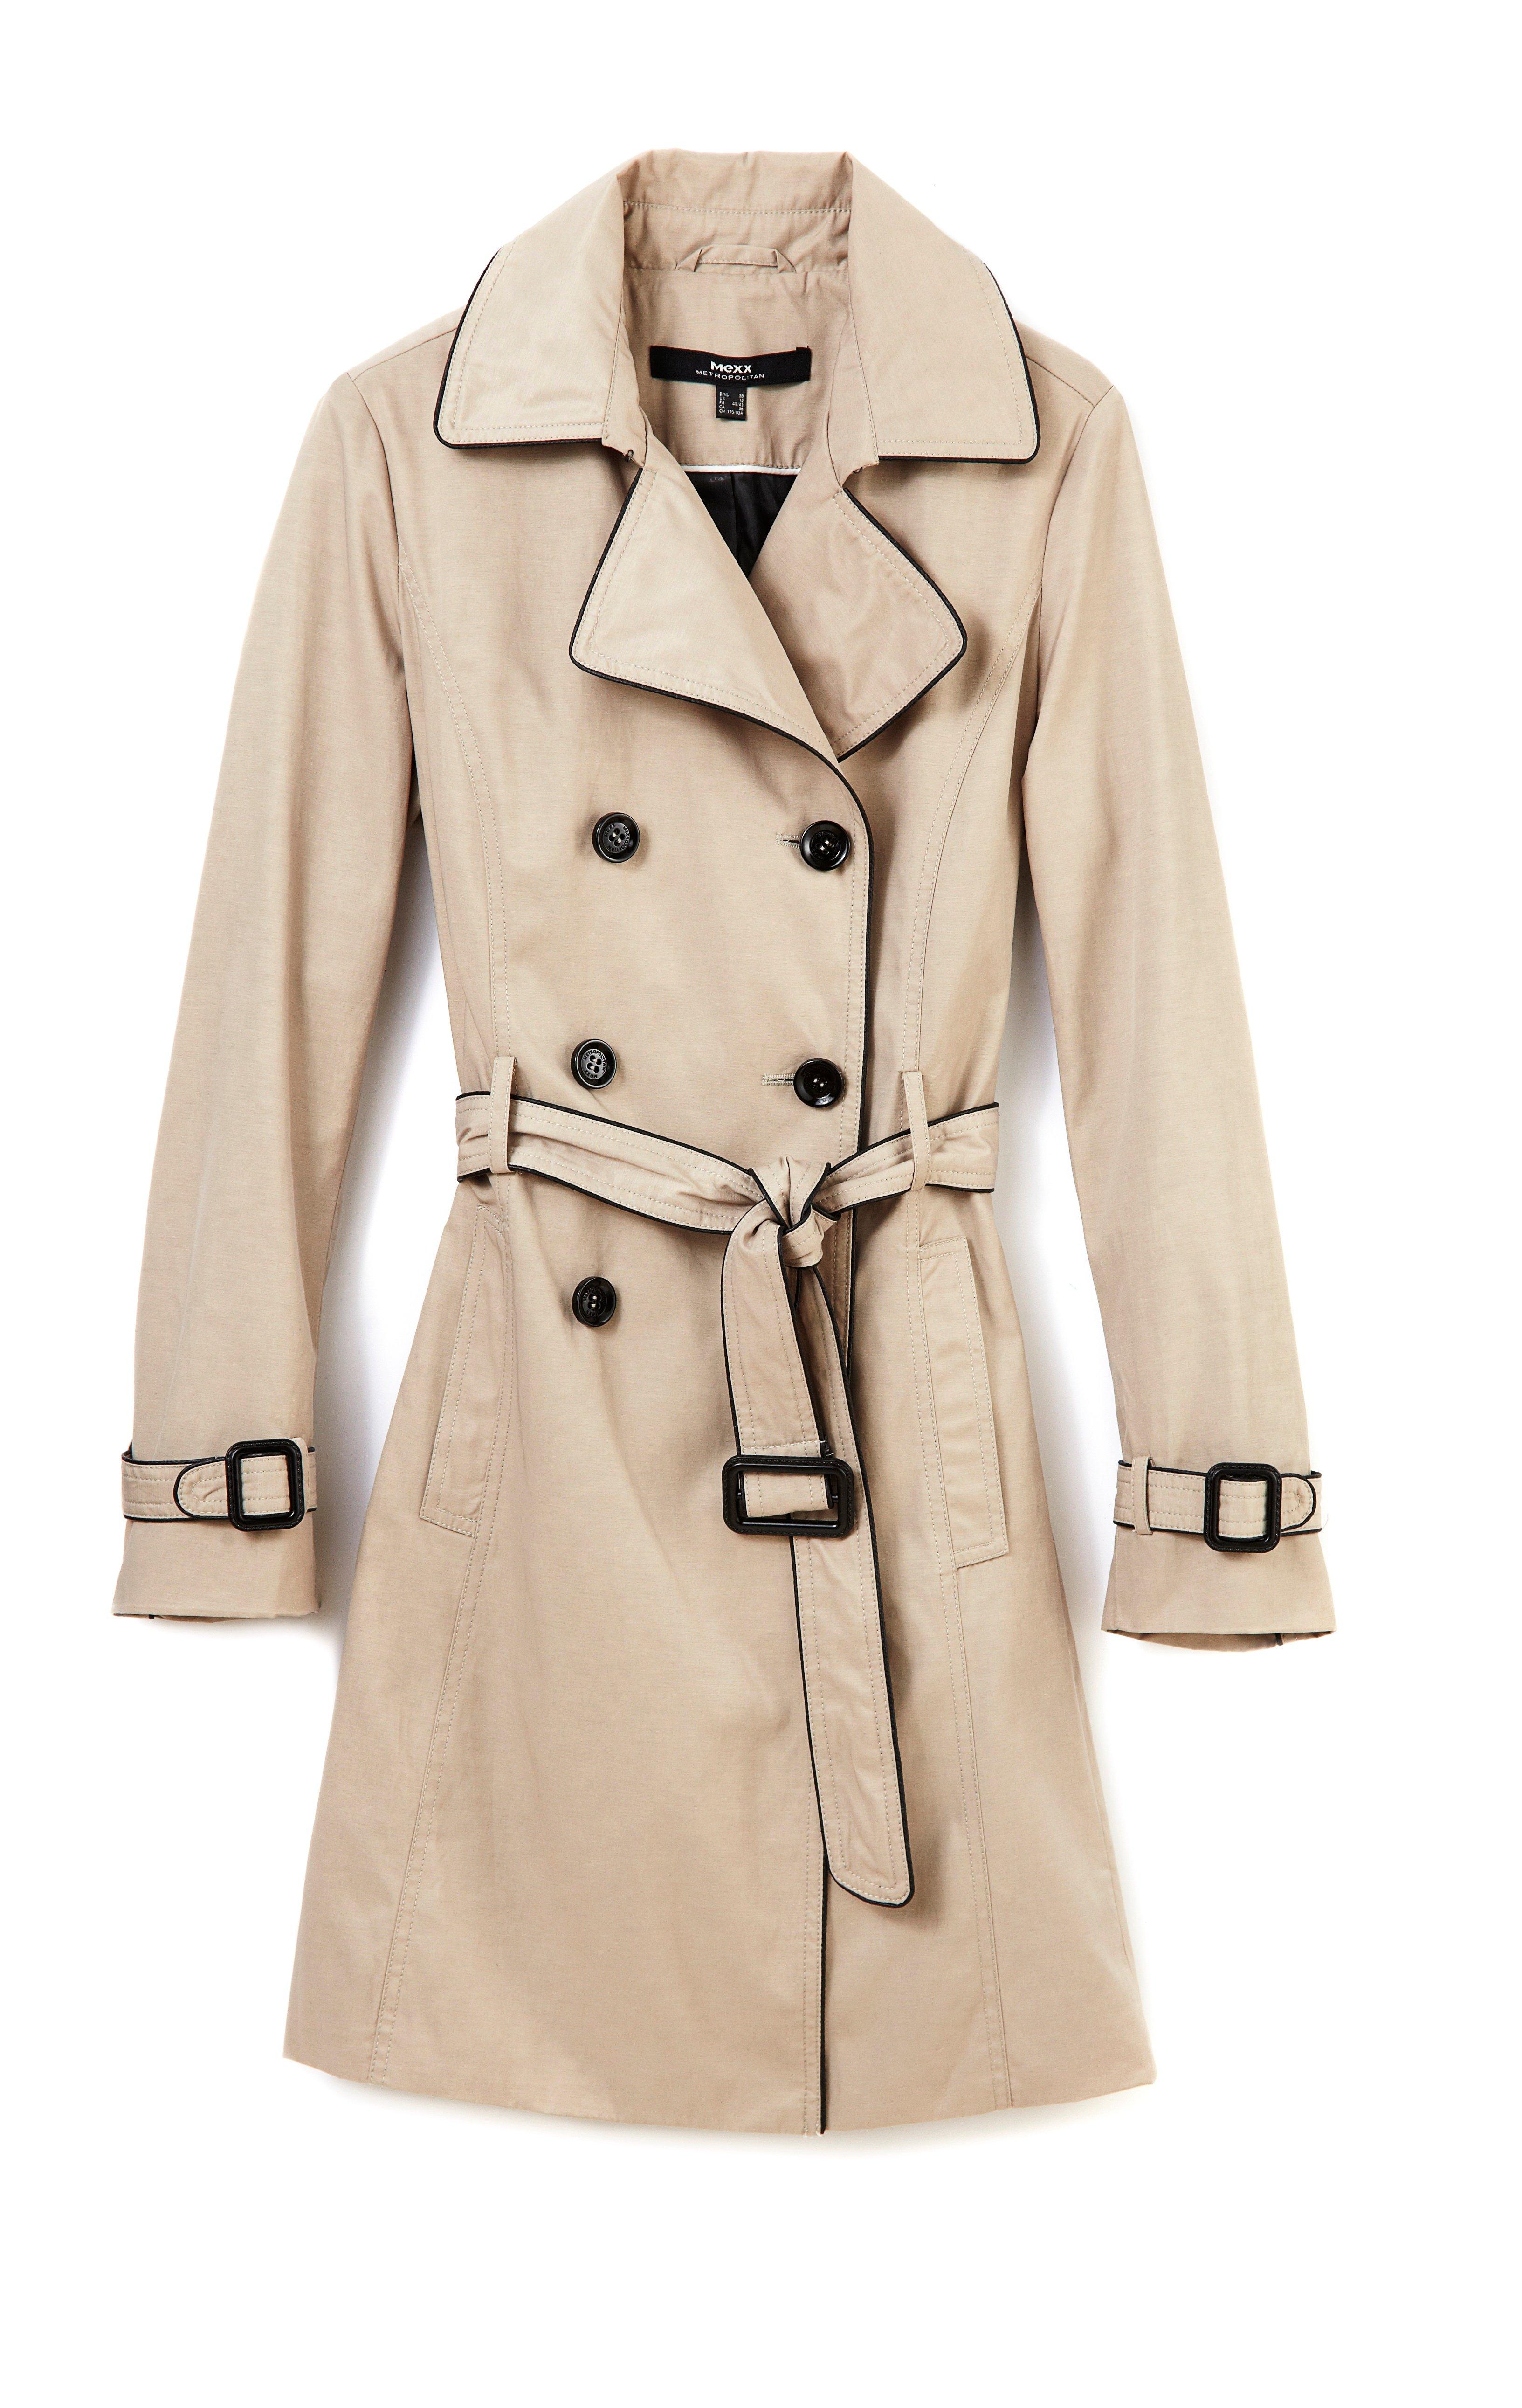 10 terrific spring trench coats